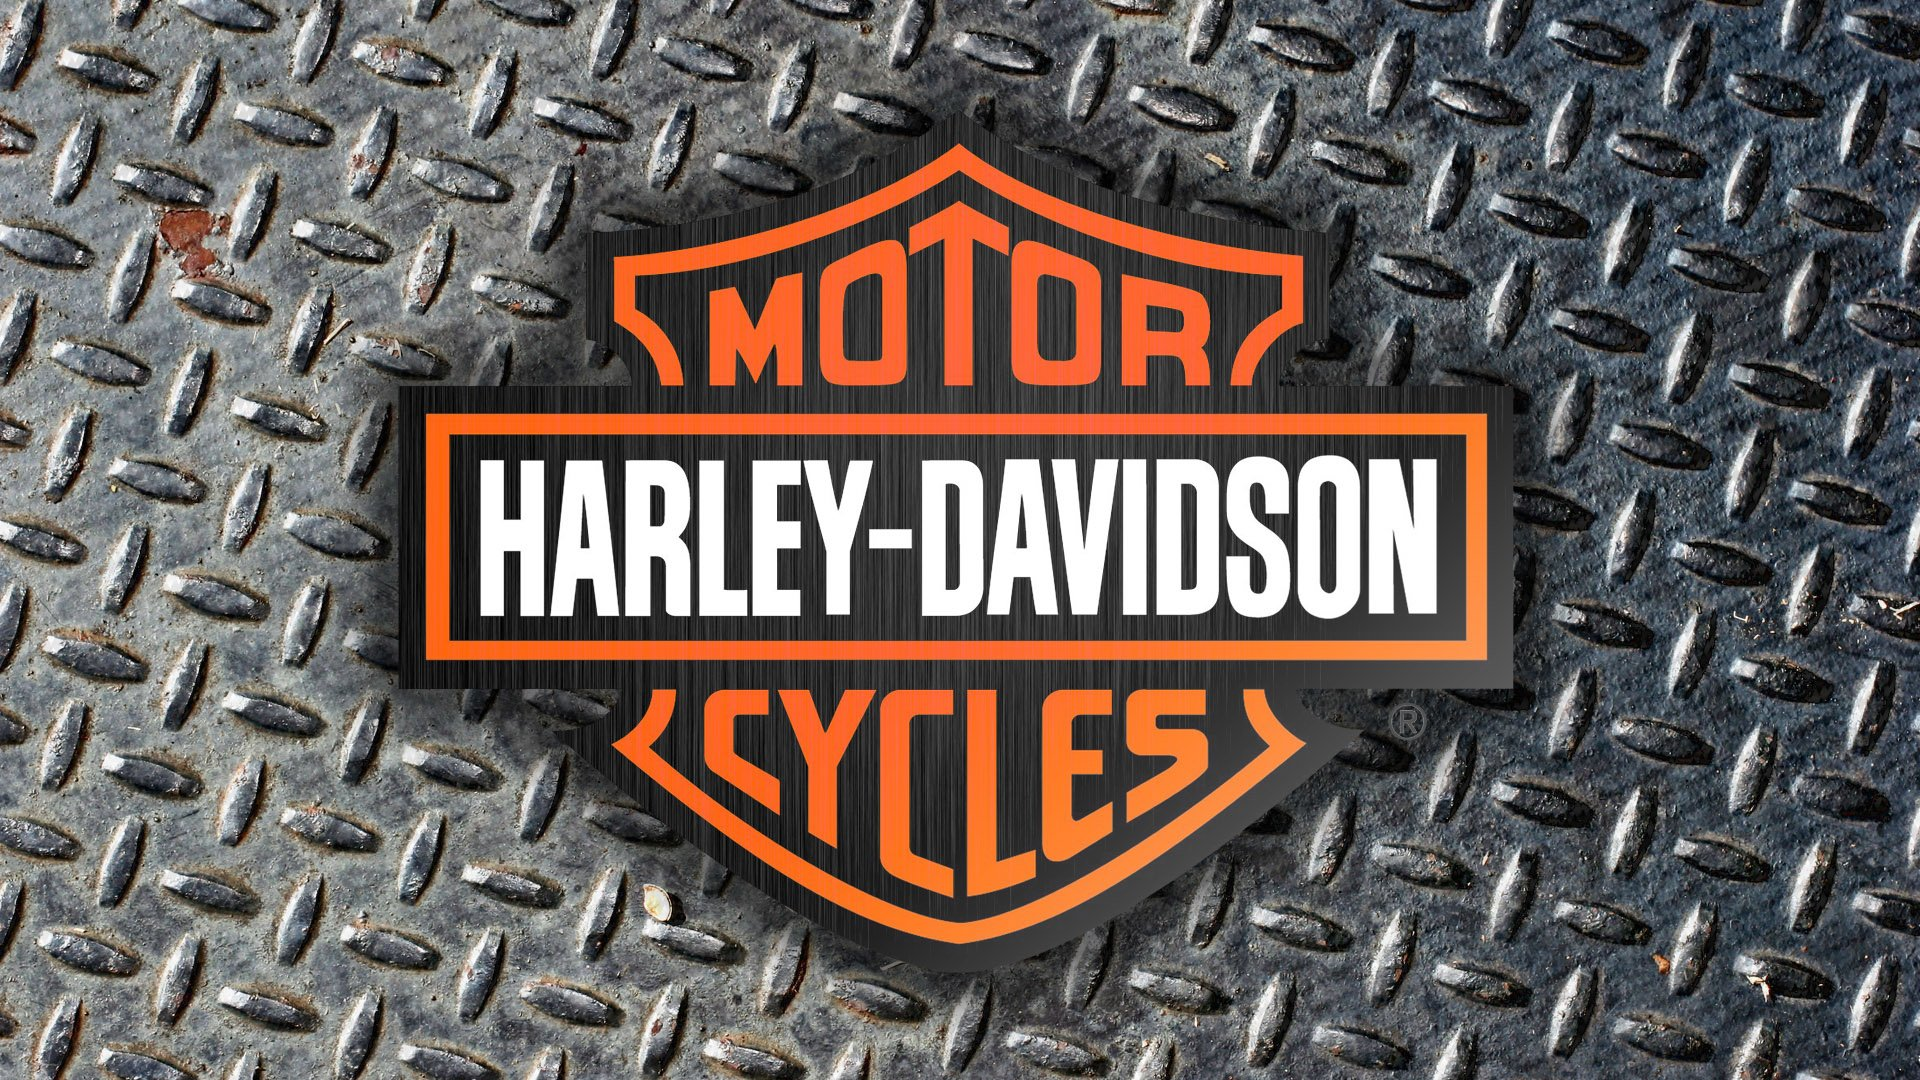 Vehicles - Harley-Davidson  Logo Wallpaper